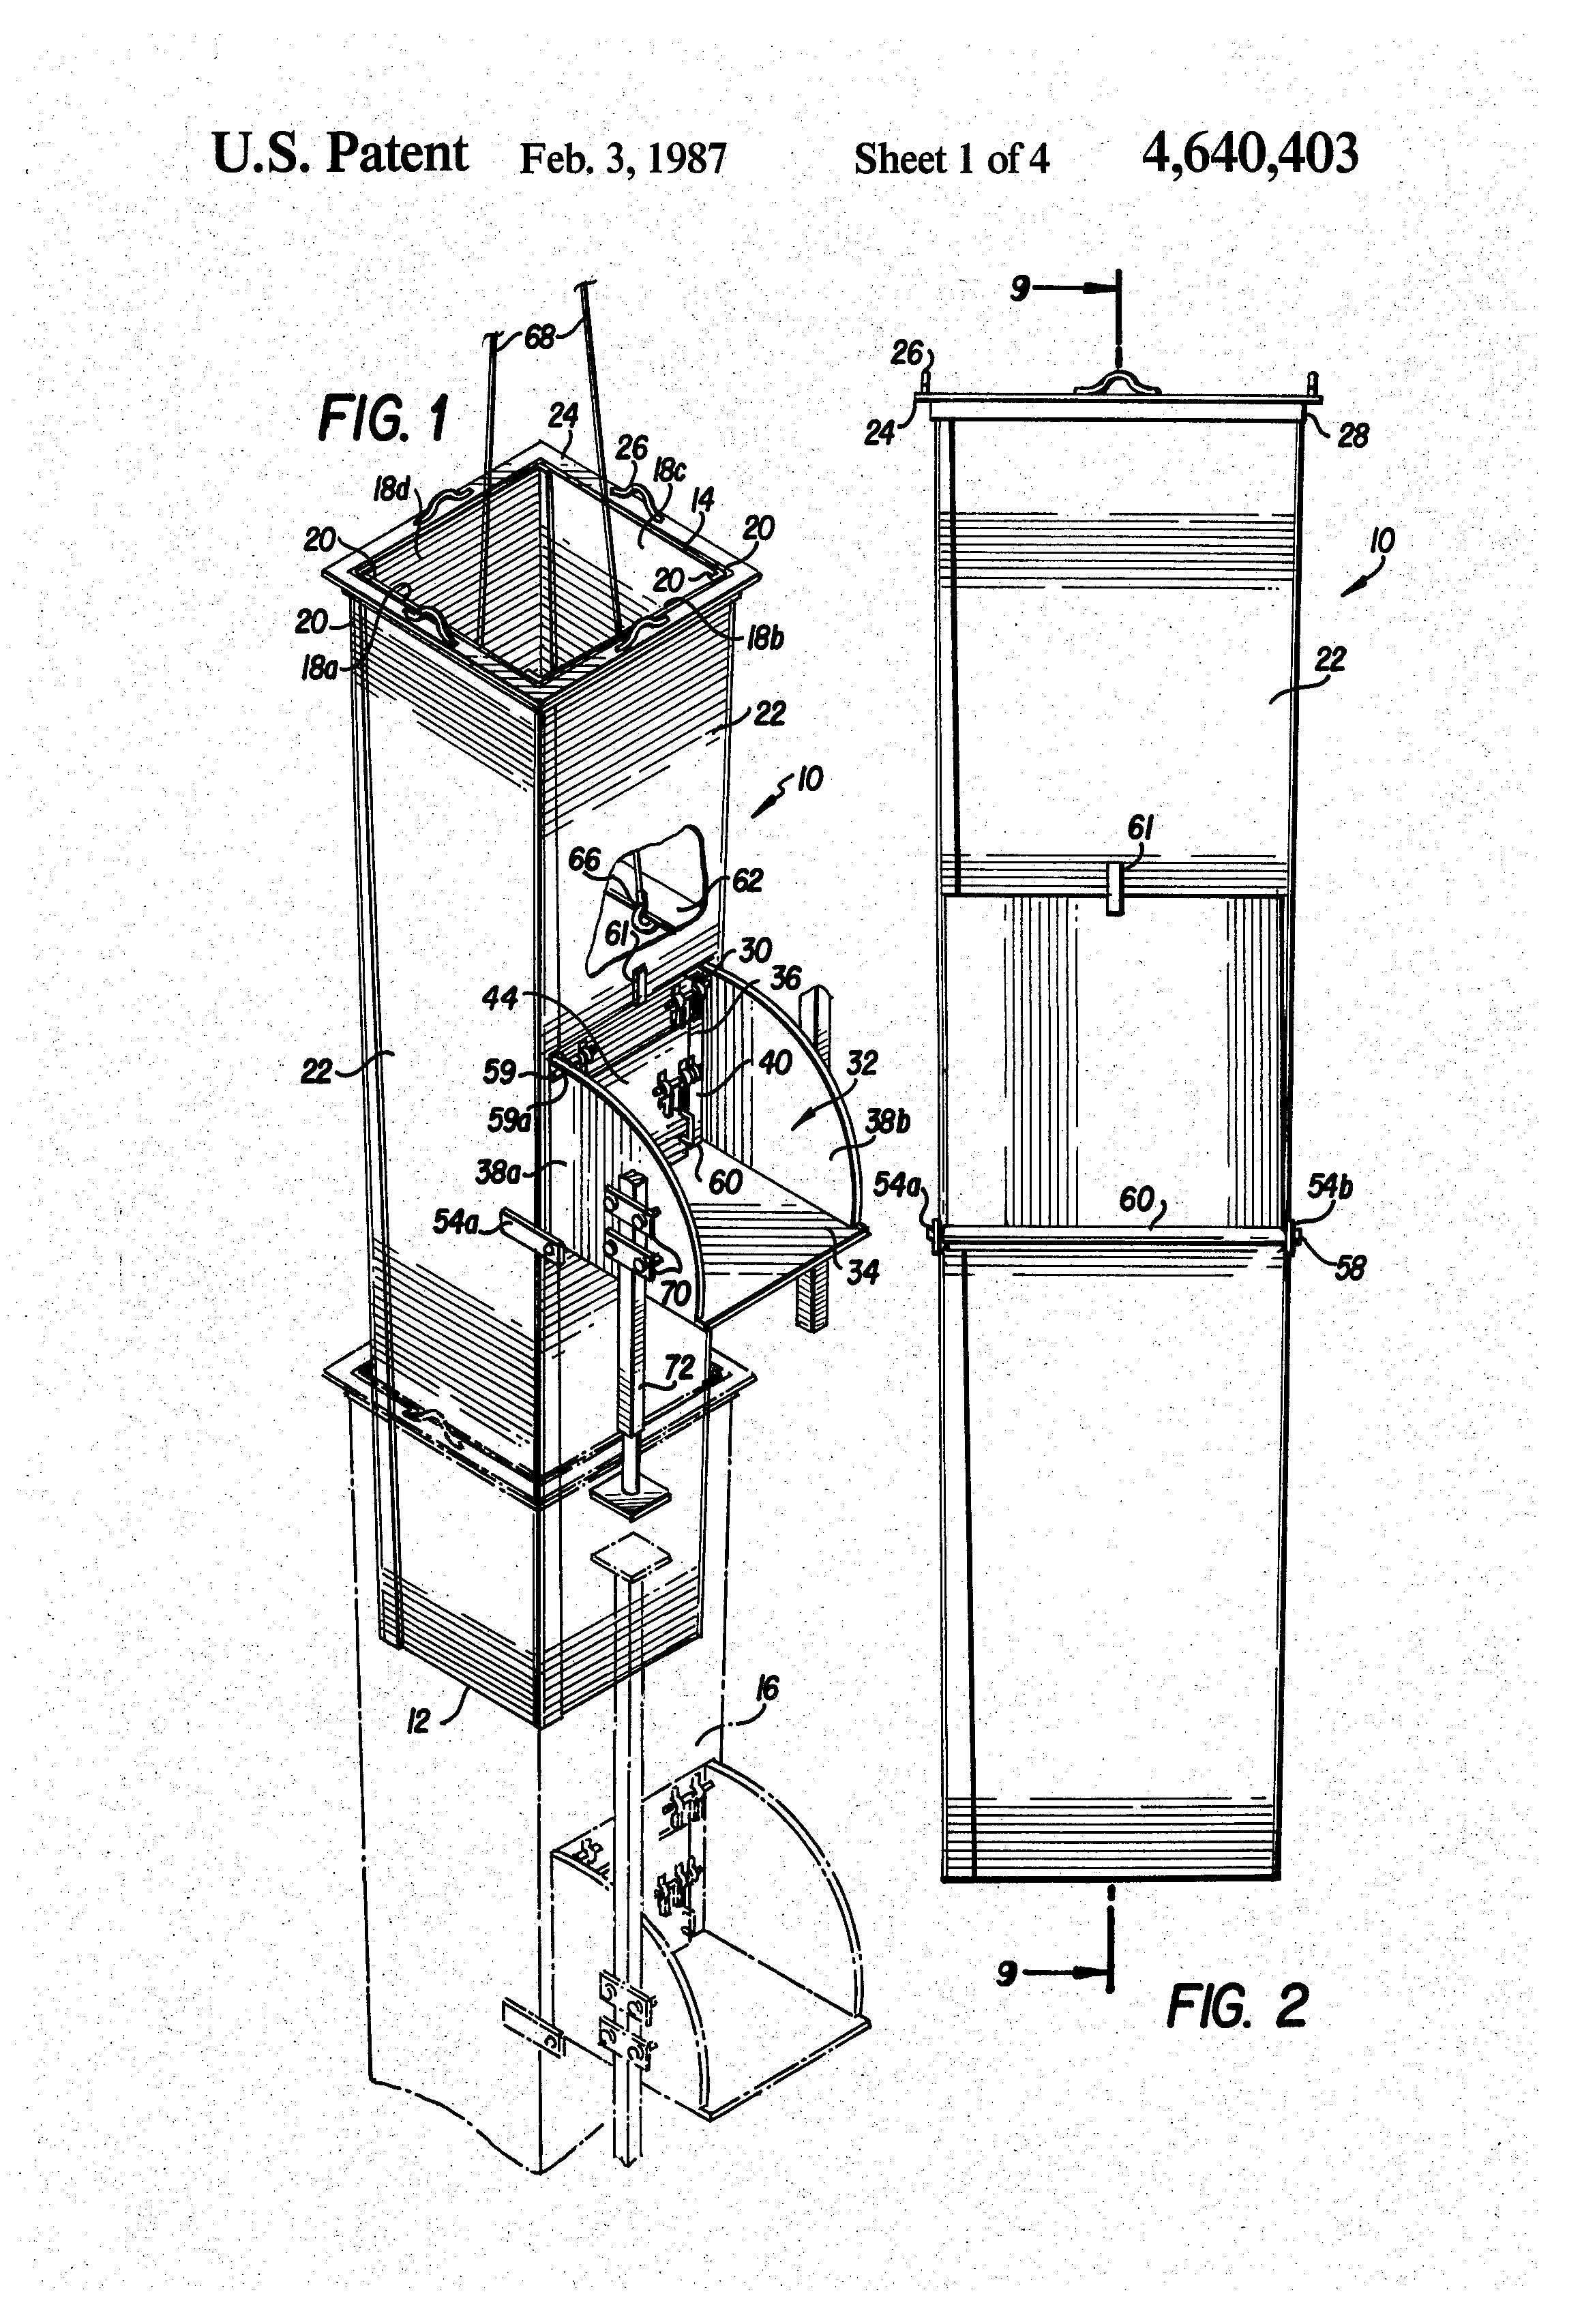 Trash Chute Dimensions : Patent us gravity conveyor chute section google